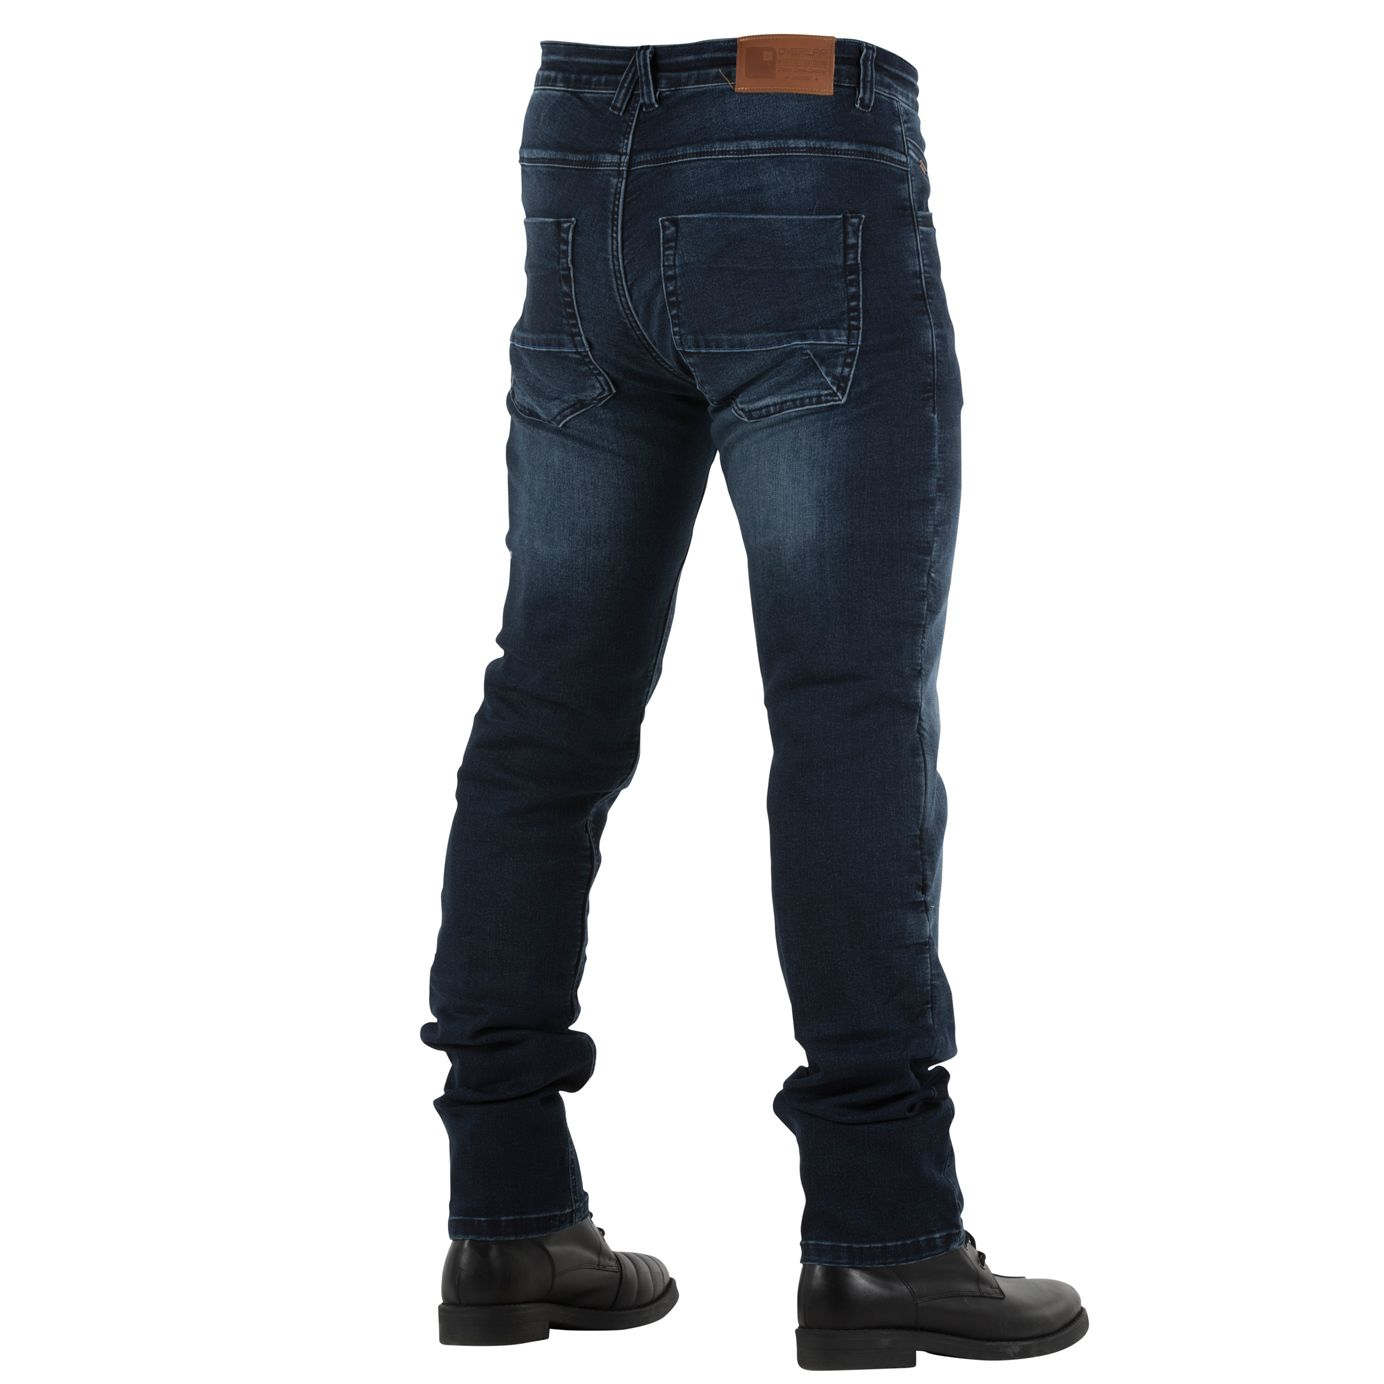 pantalon moto homme pas cher overlap